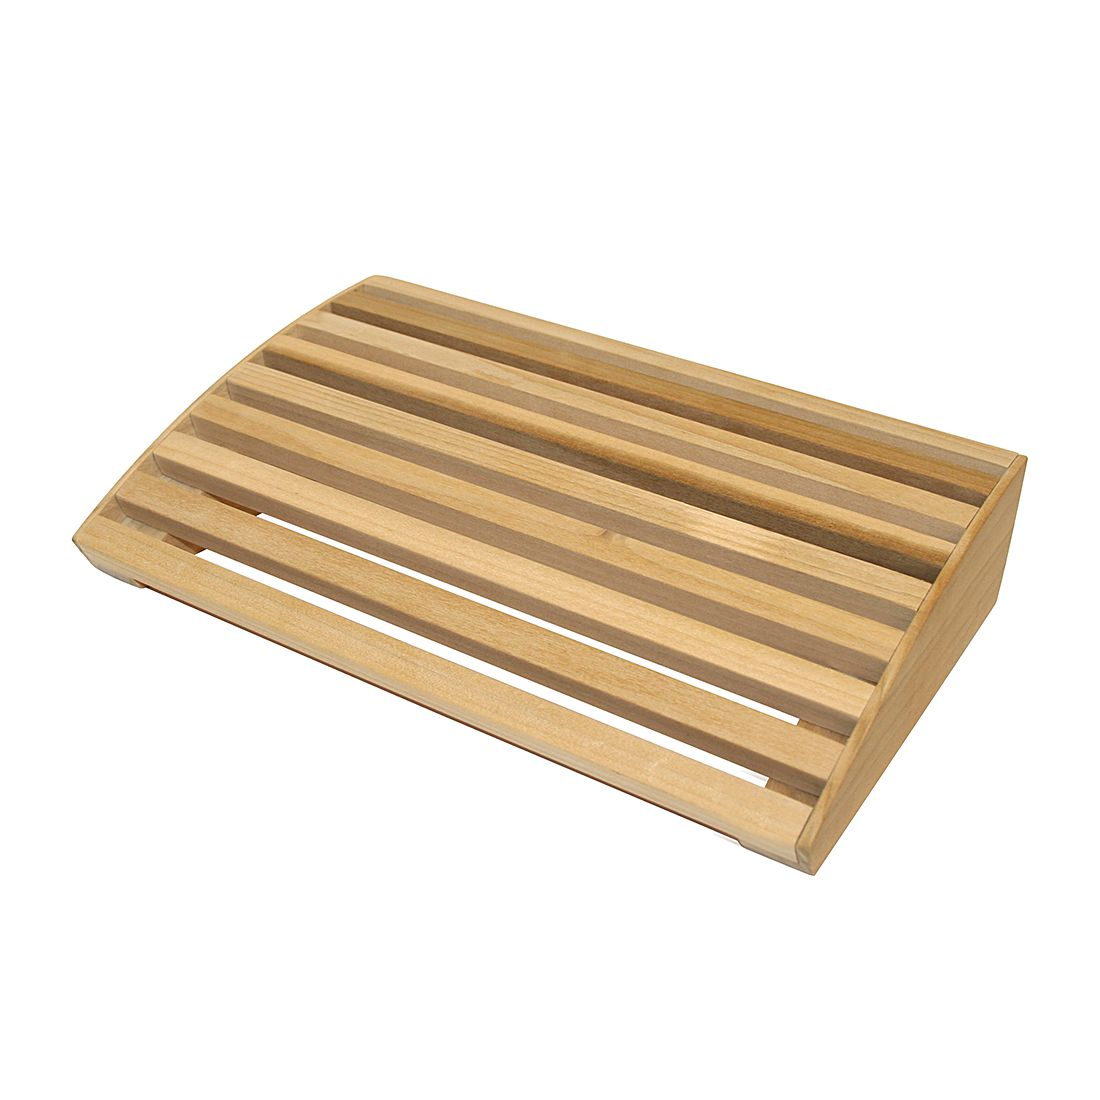 Sauna neksteun - gewelfd, Nicol Wohnausstattungen